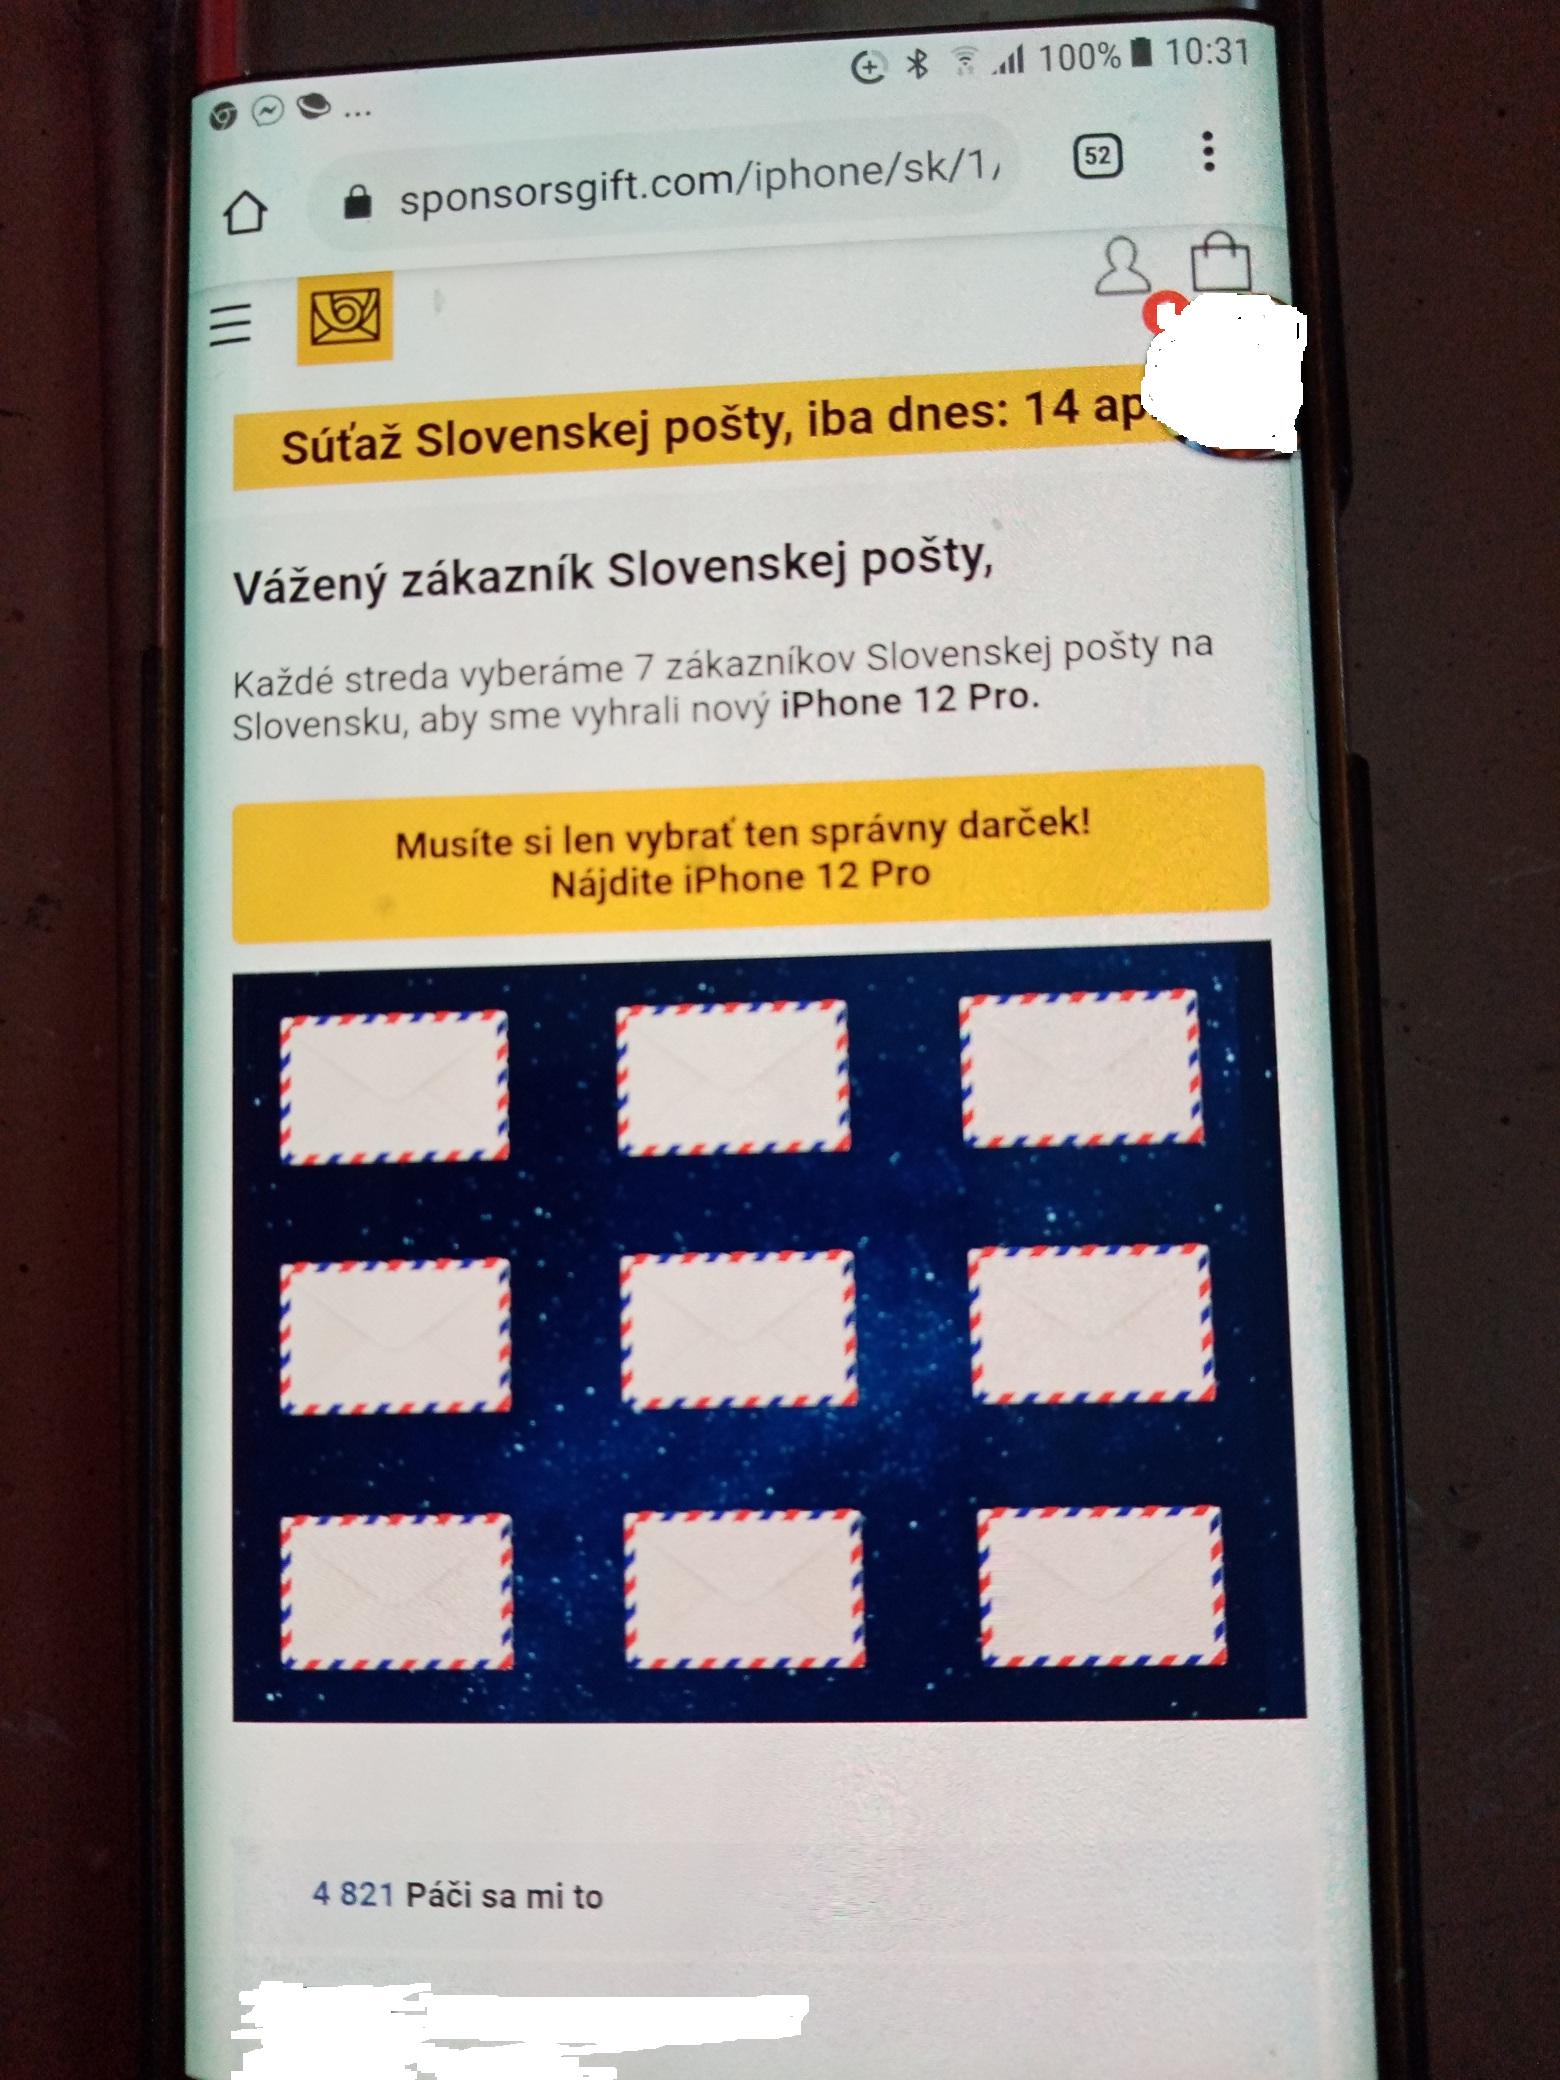 SMS podvodna slovenska posta ceska spam